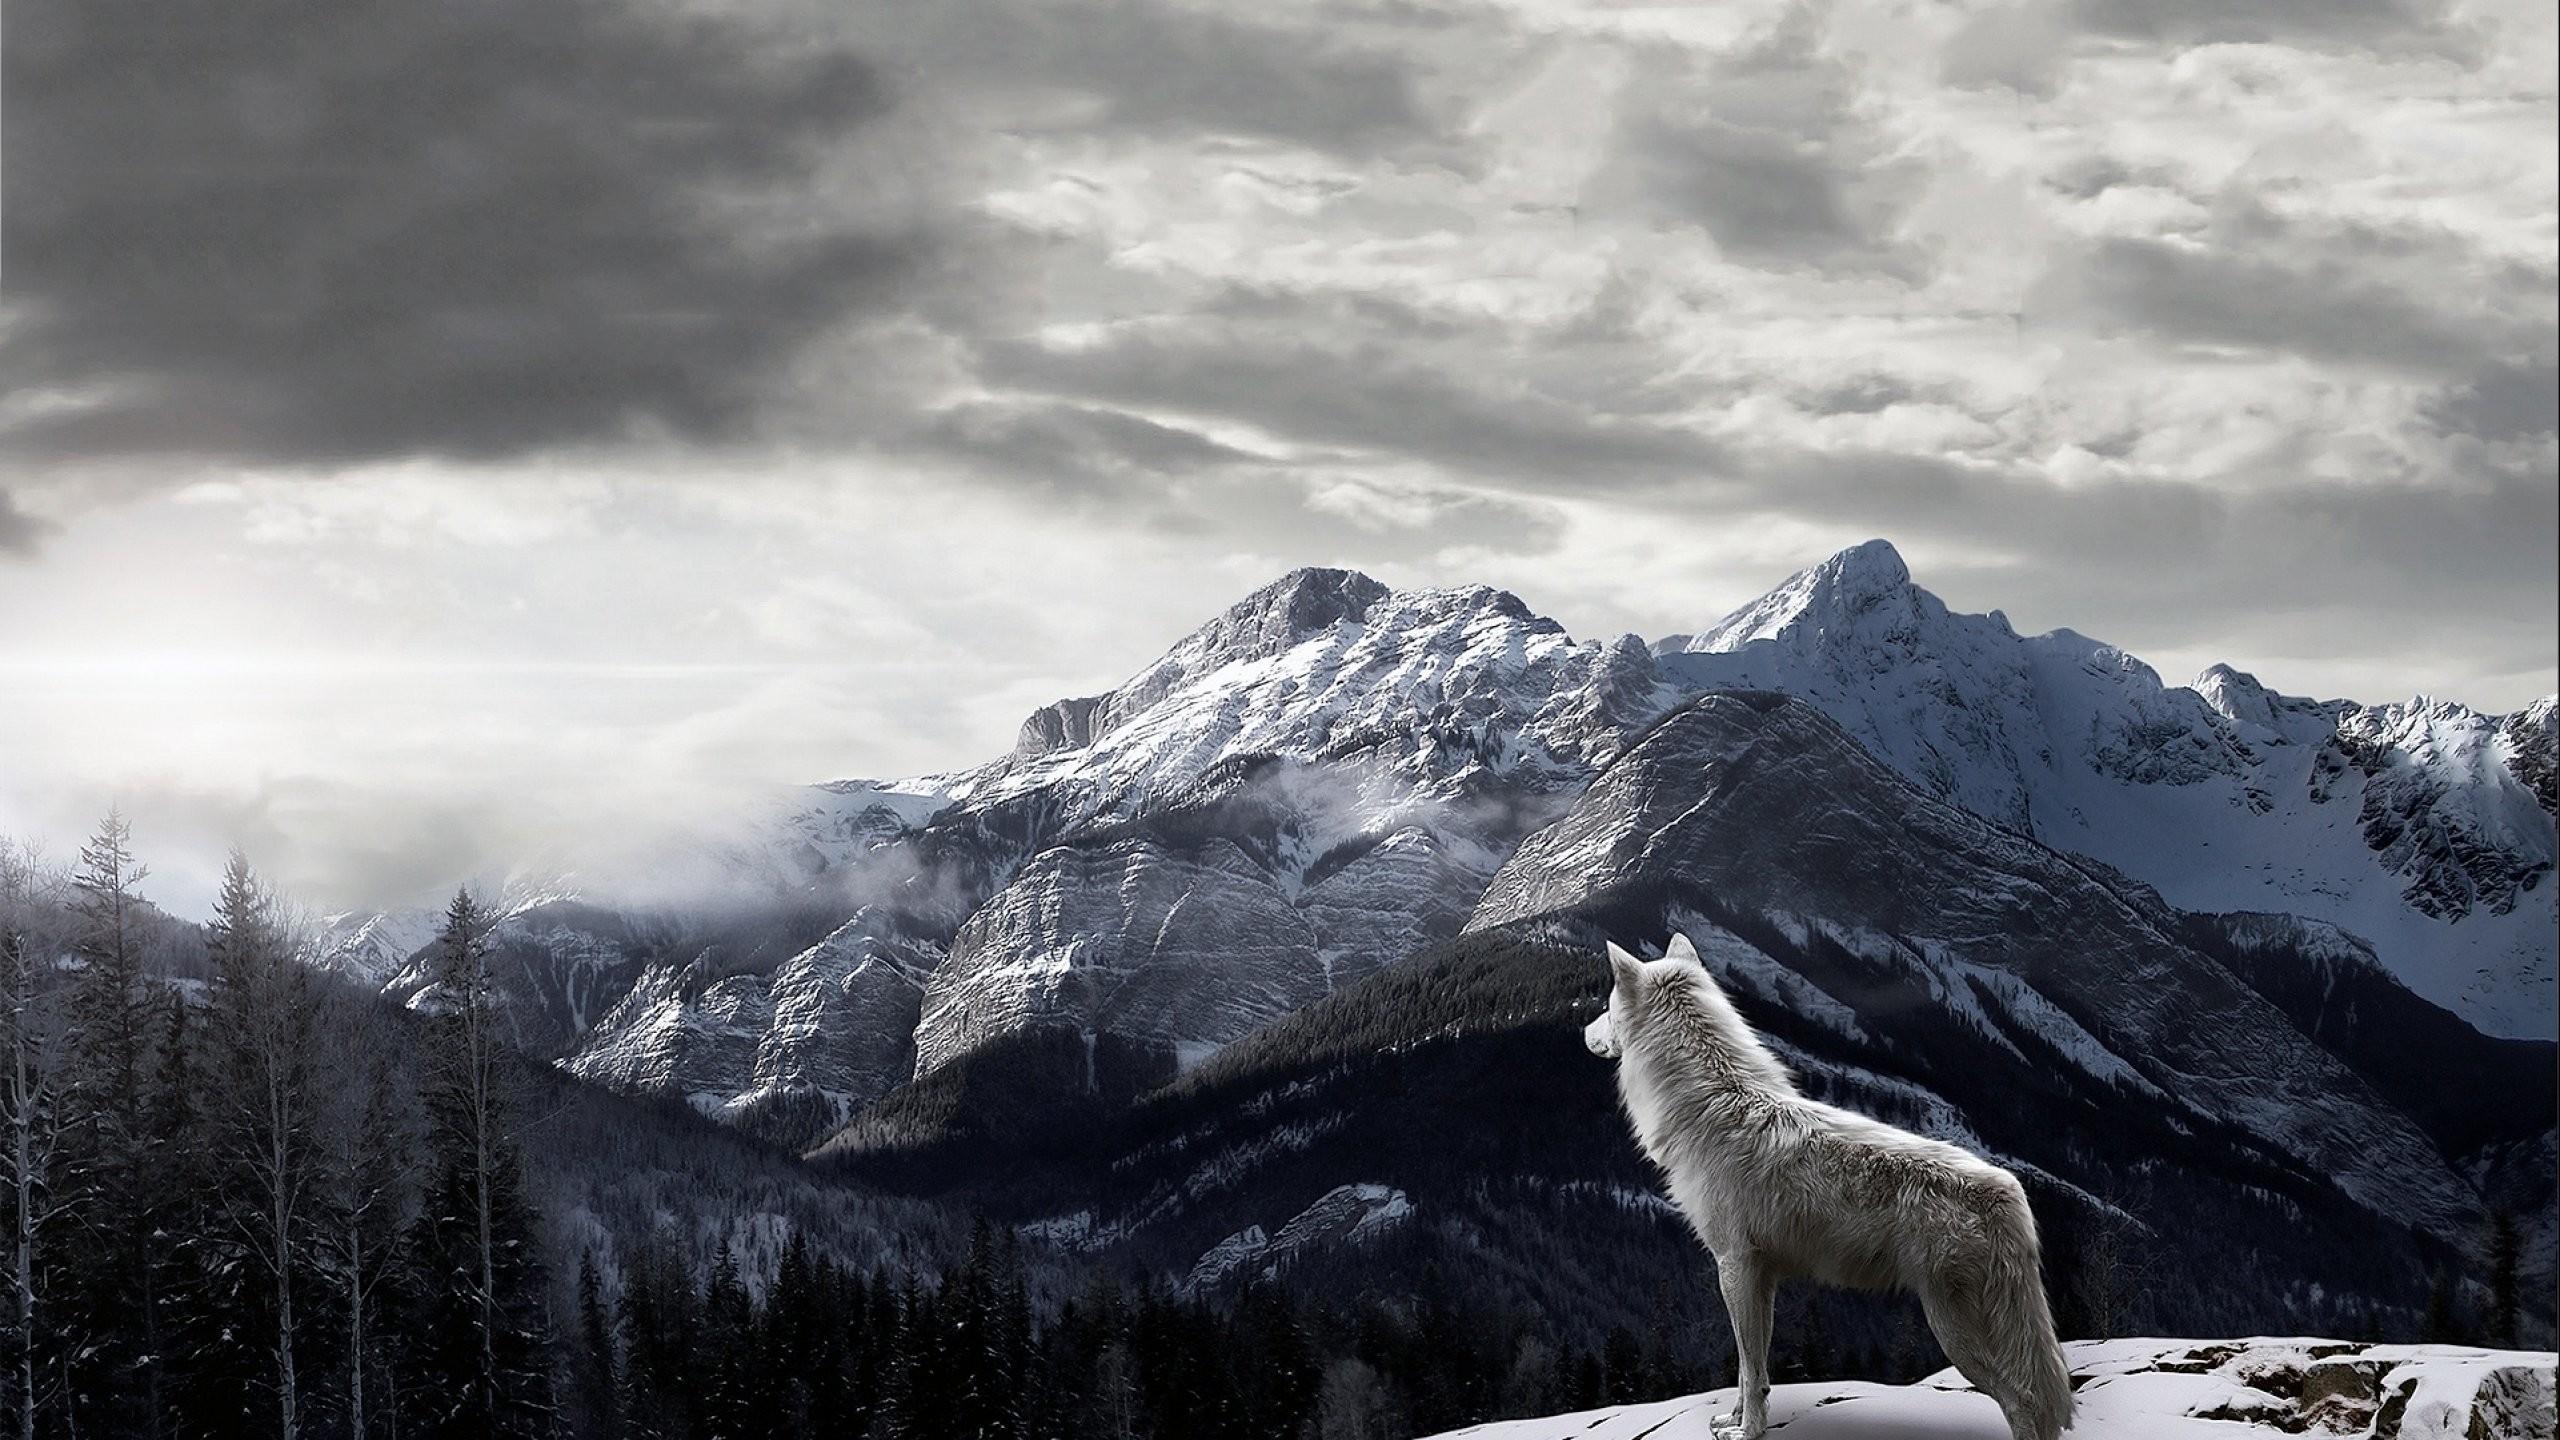 1920x1080 1920x1080 Woods Wolves Wallpaper 1920x1080 Woods, Wolves